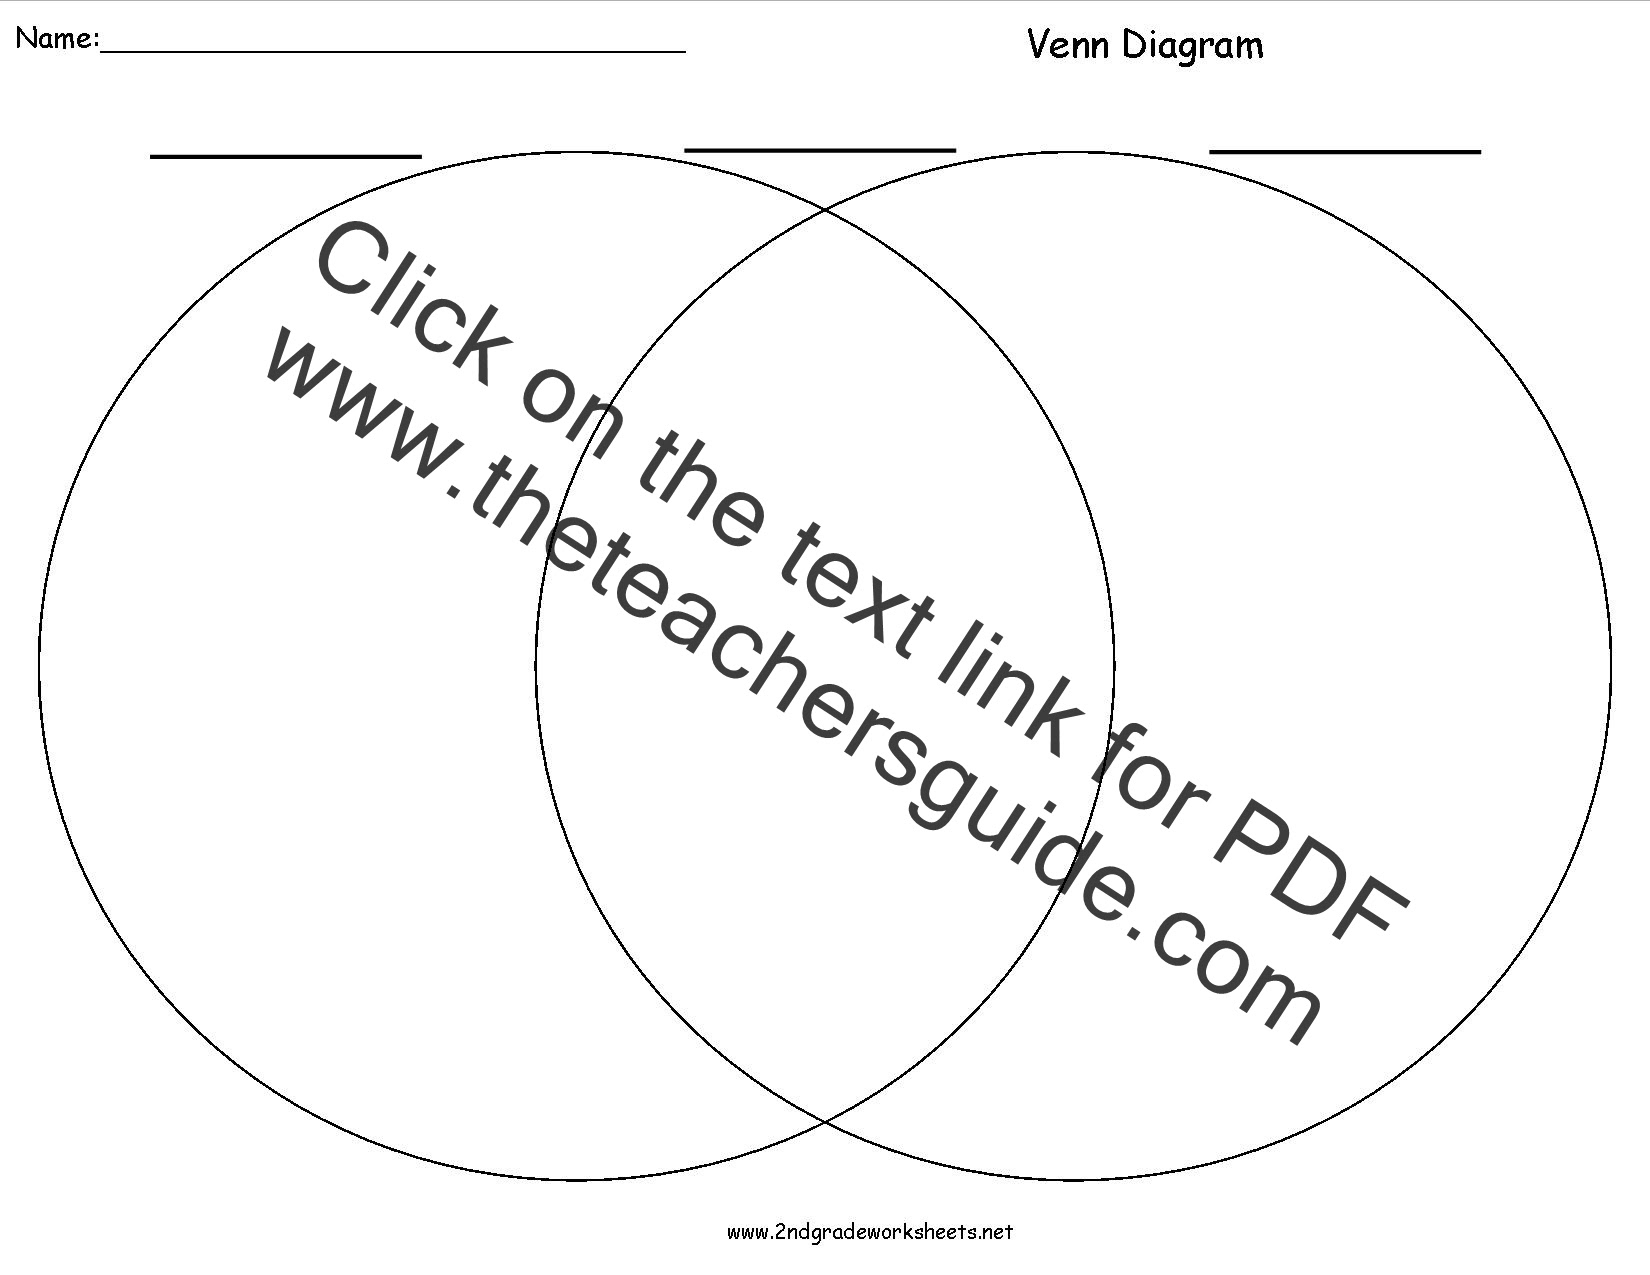 blank venn diagram printable white gold. Black Bedroom Furniture Sets. Home Design Ideas